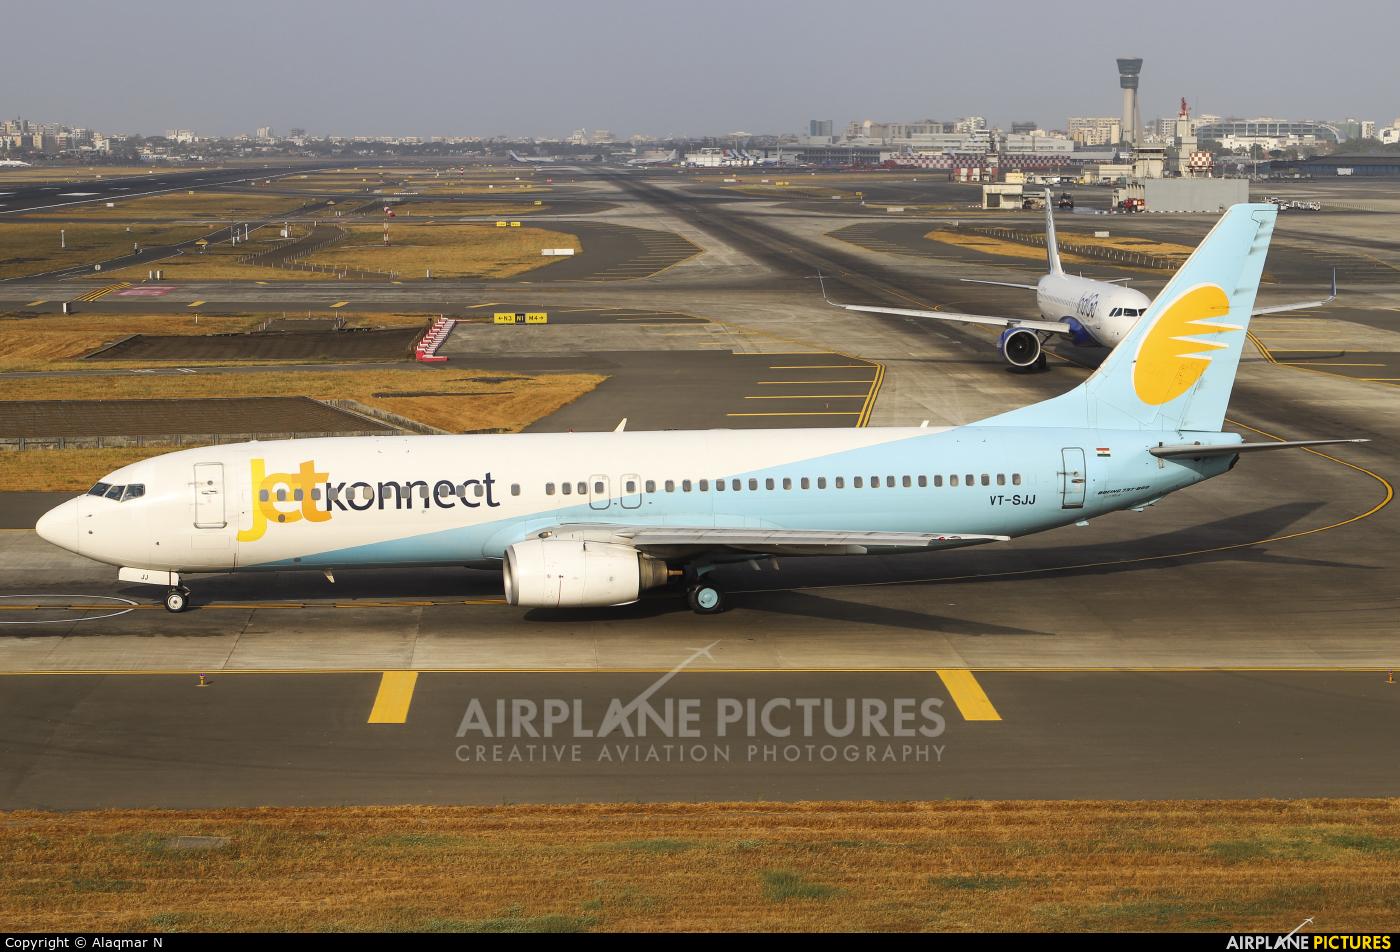 JetKonnect VT-SJJ aircraft at Mumbai - Chhatrapati Shivaji Intl